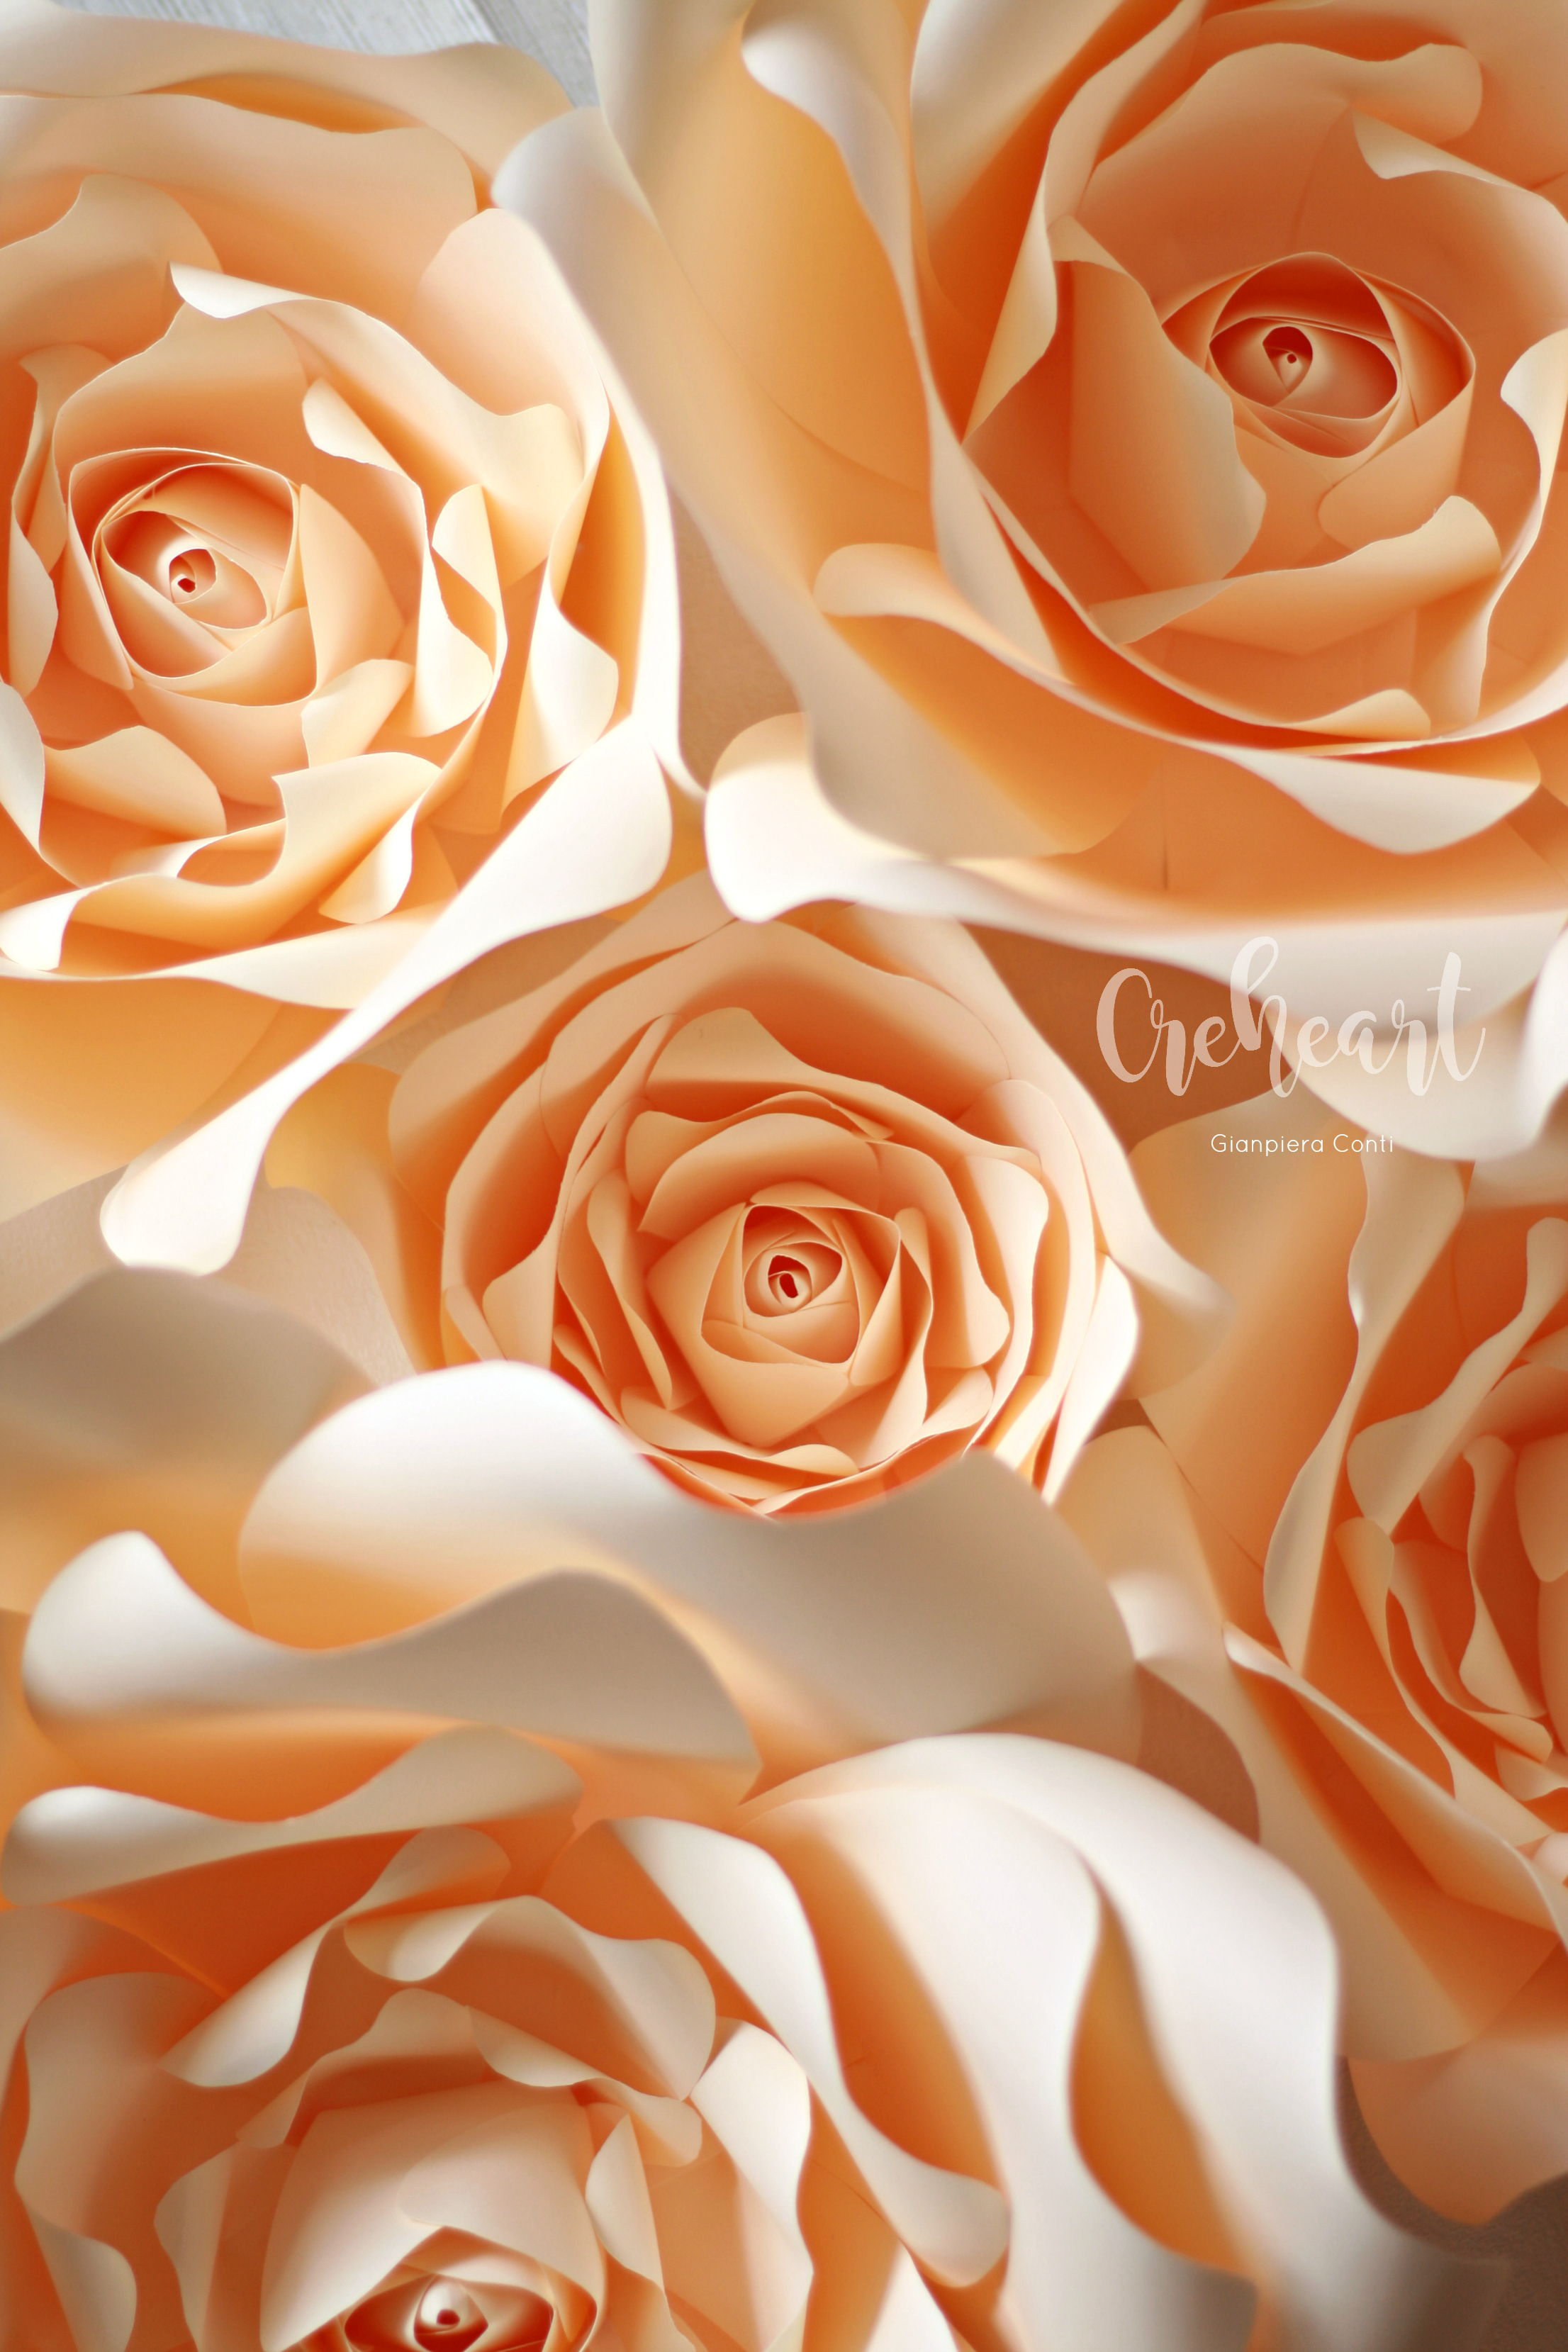 Ivory Roses Creheart GC.jpg